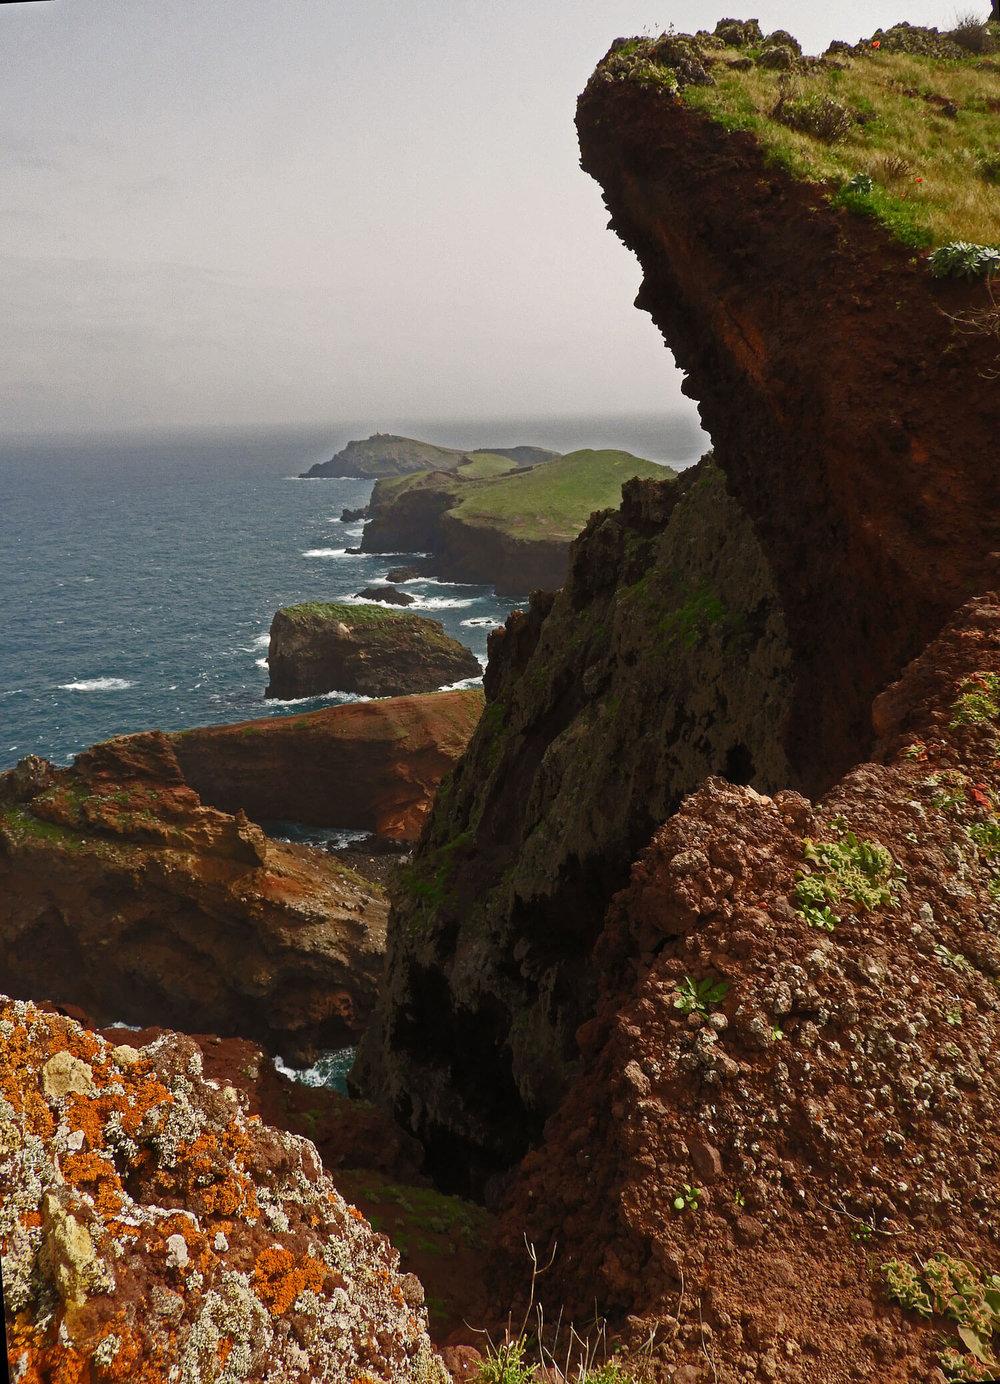 portugal-madeira-island-hike-ponta-sao-lourenco.jpg